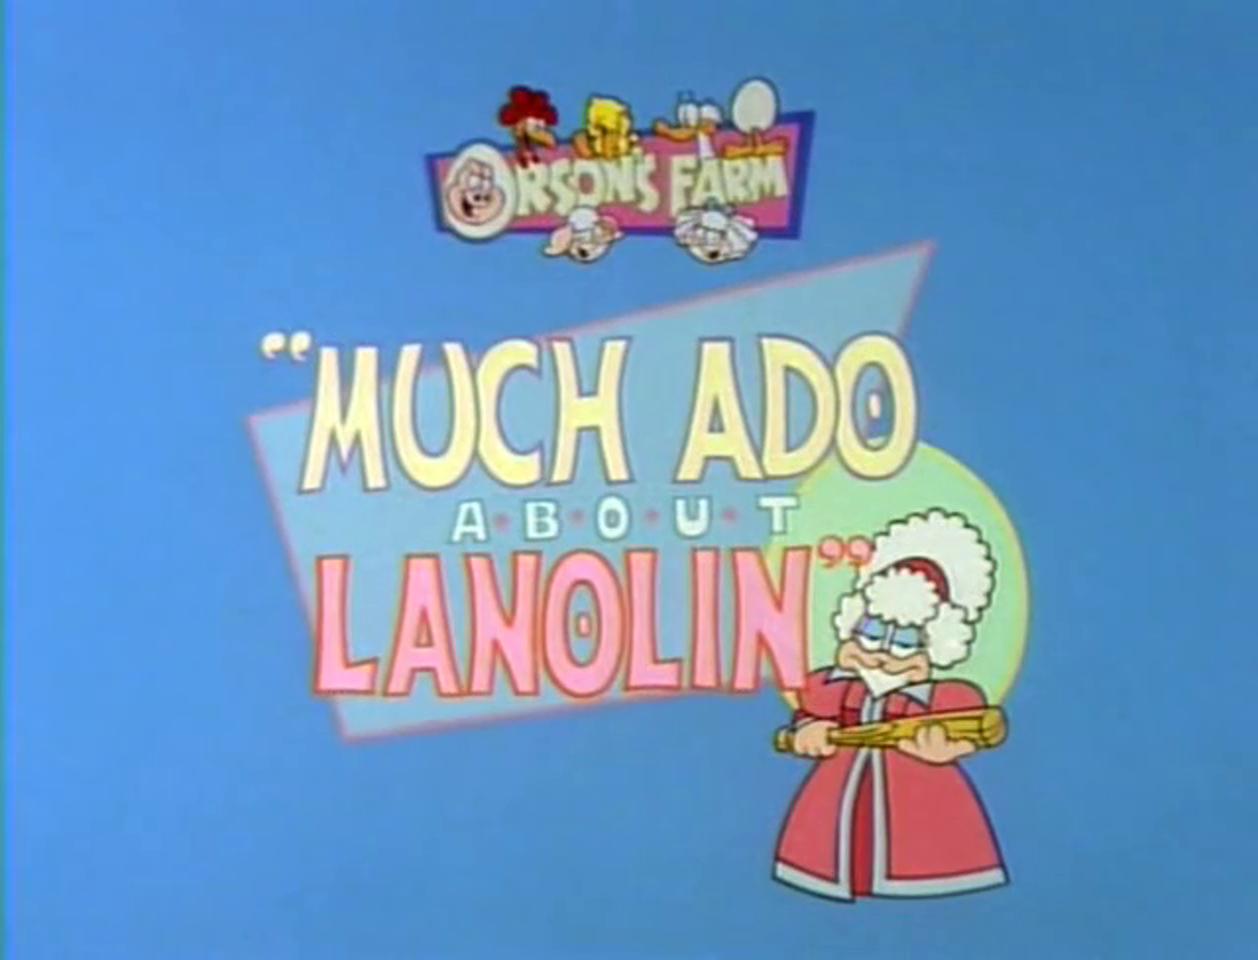 Much Ado About Lanolin